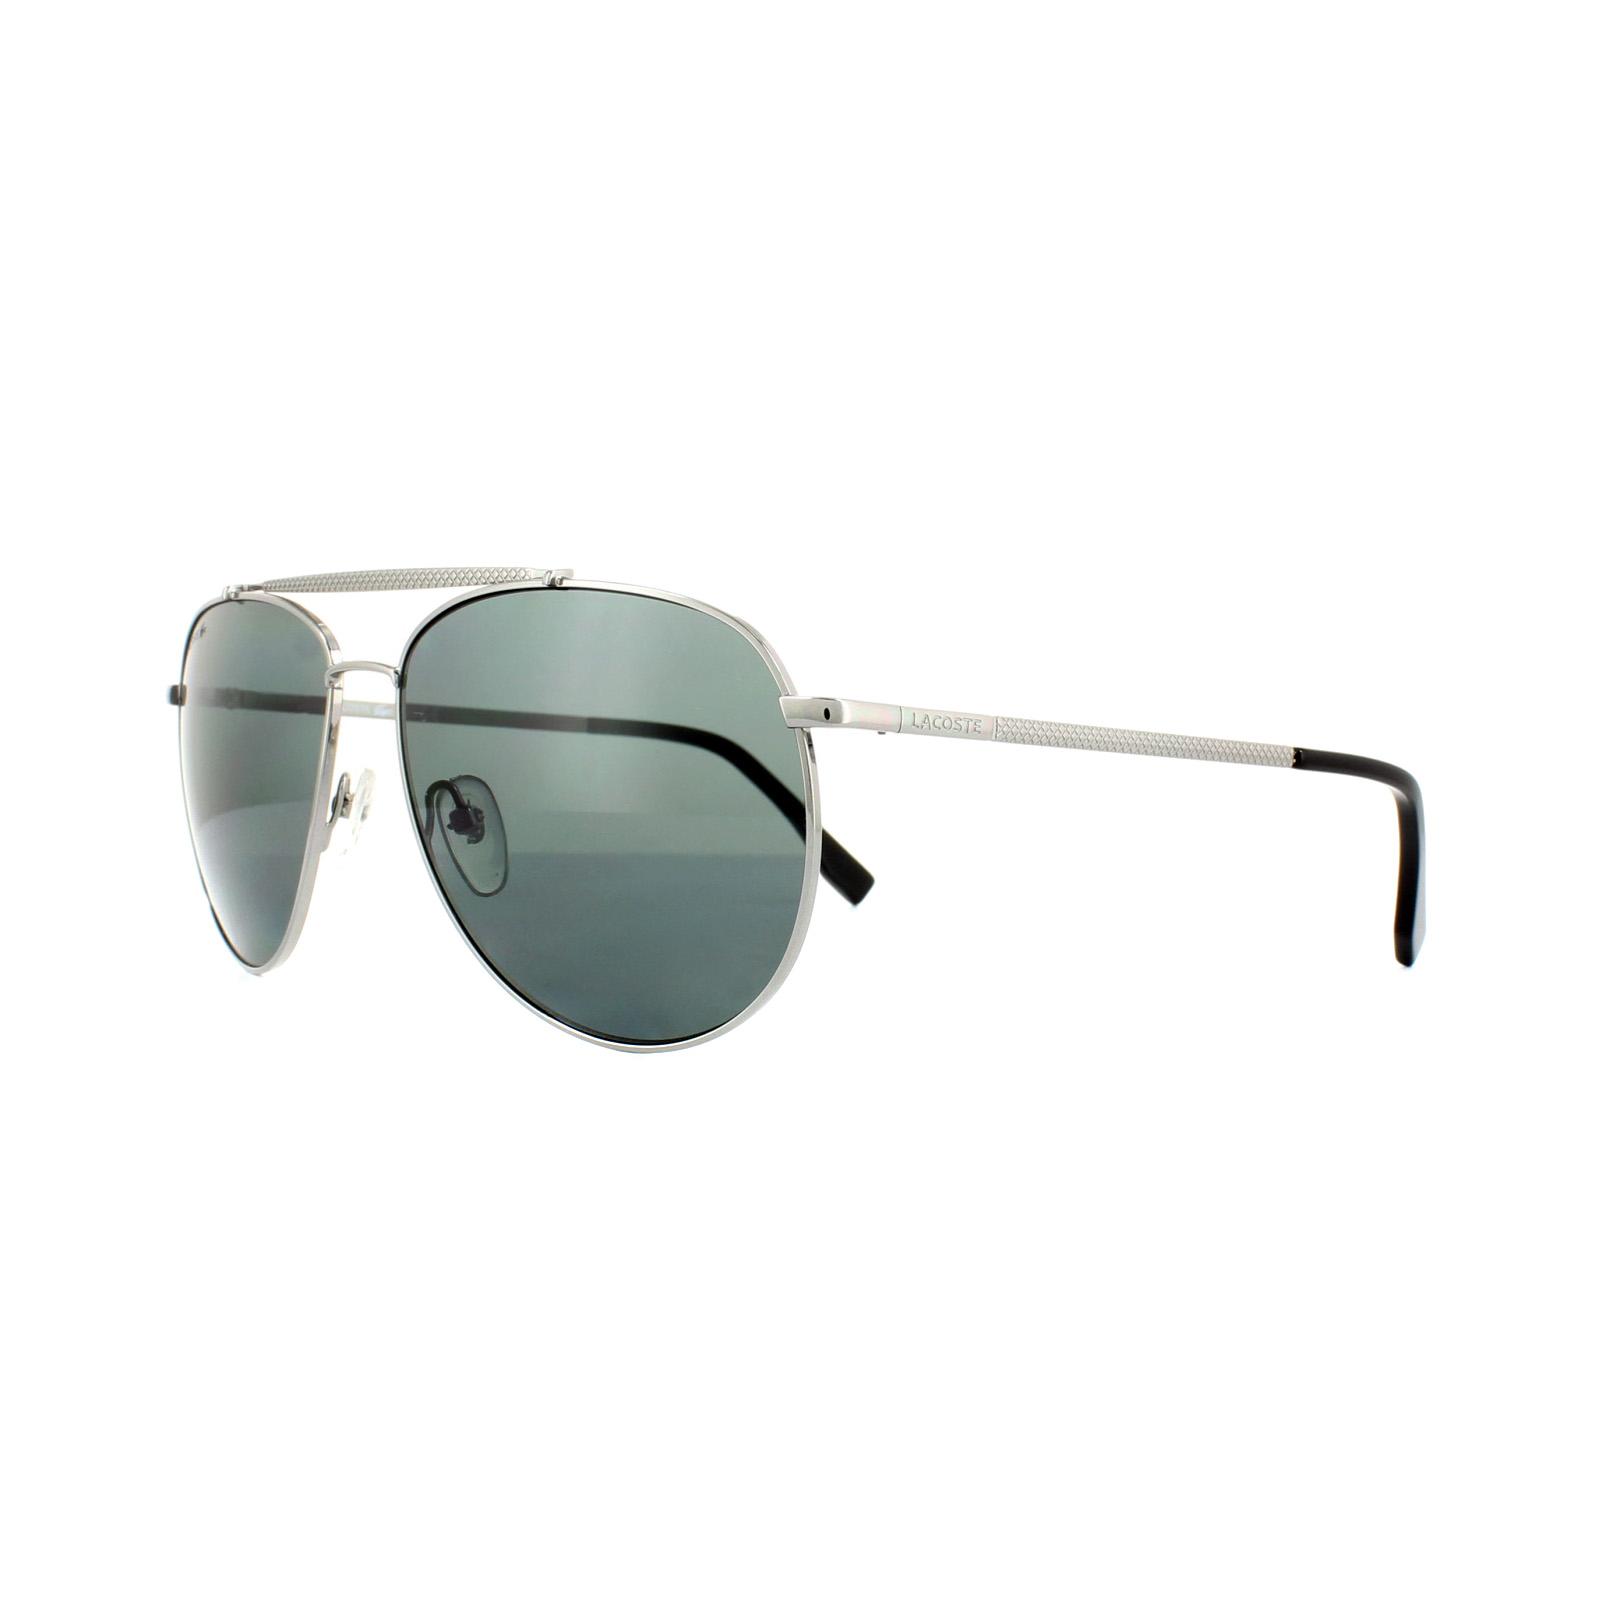 ee9f0d8fbd4 Sentinel Lacoste Sunglasses L177SP 033 Gunmetal Grey Dark Grey Polarized